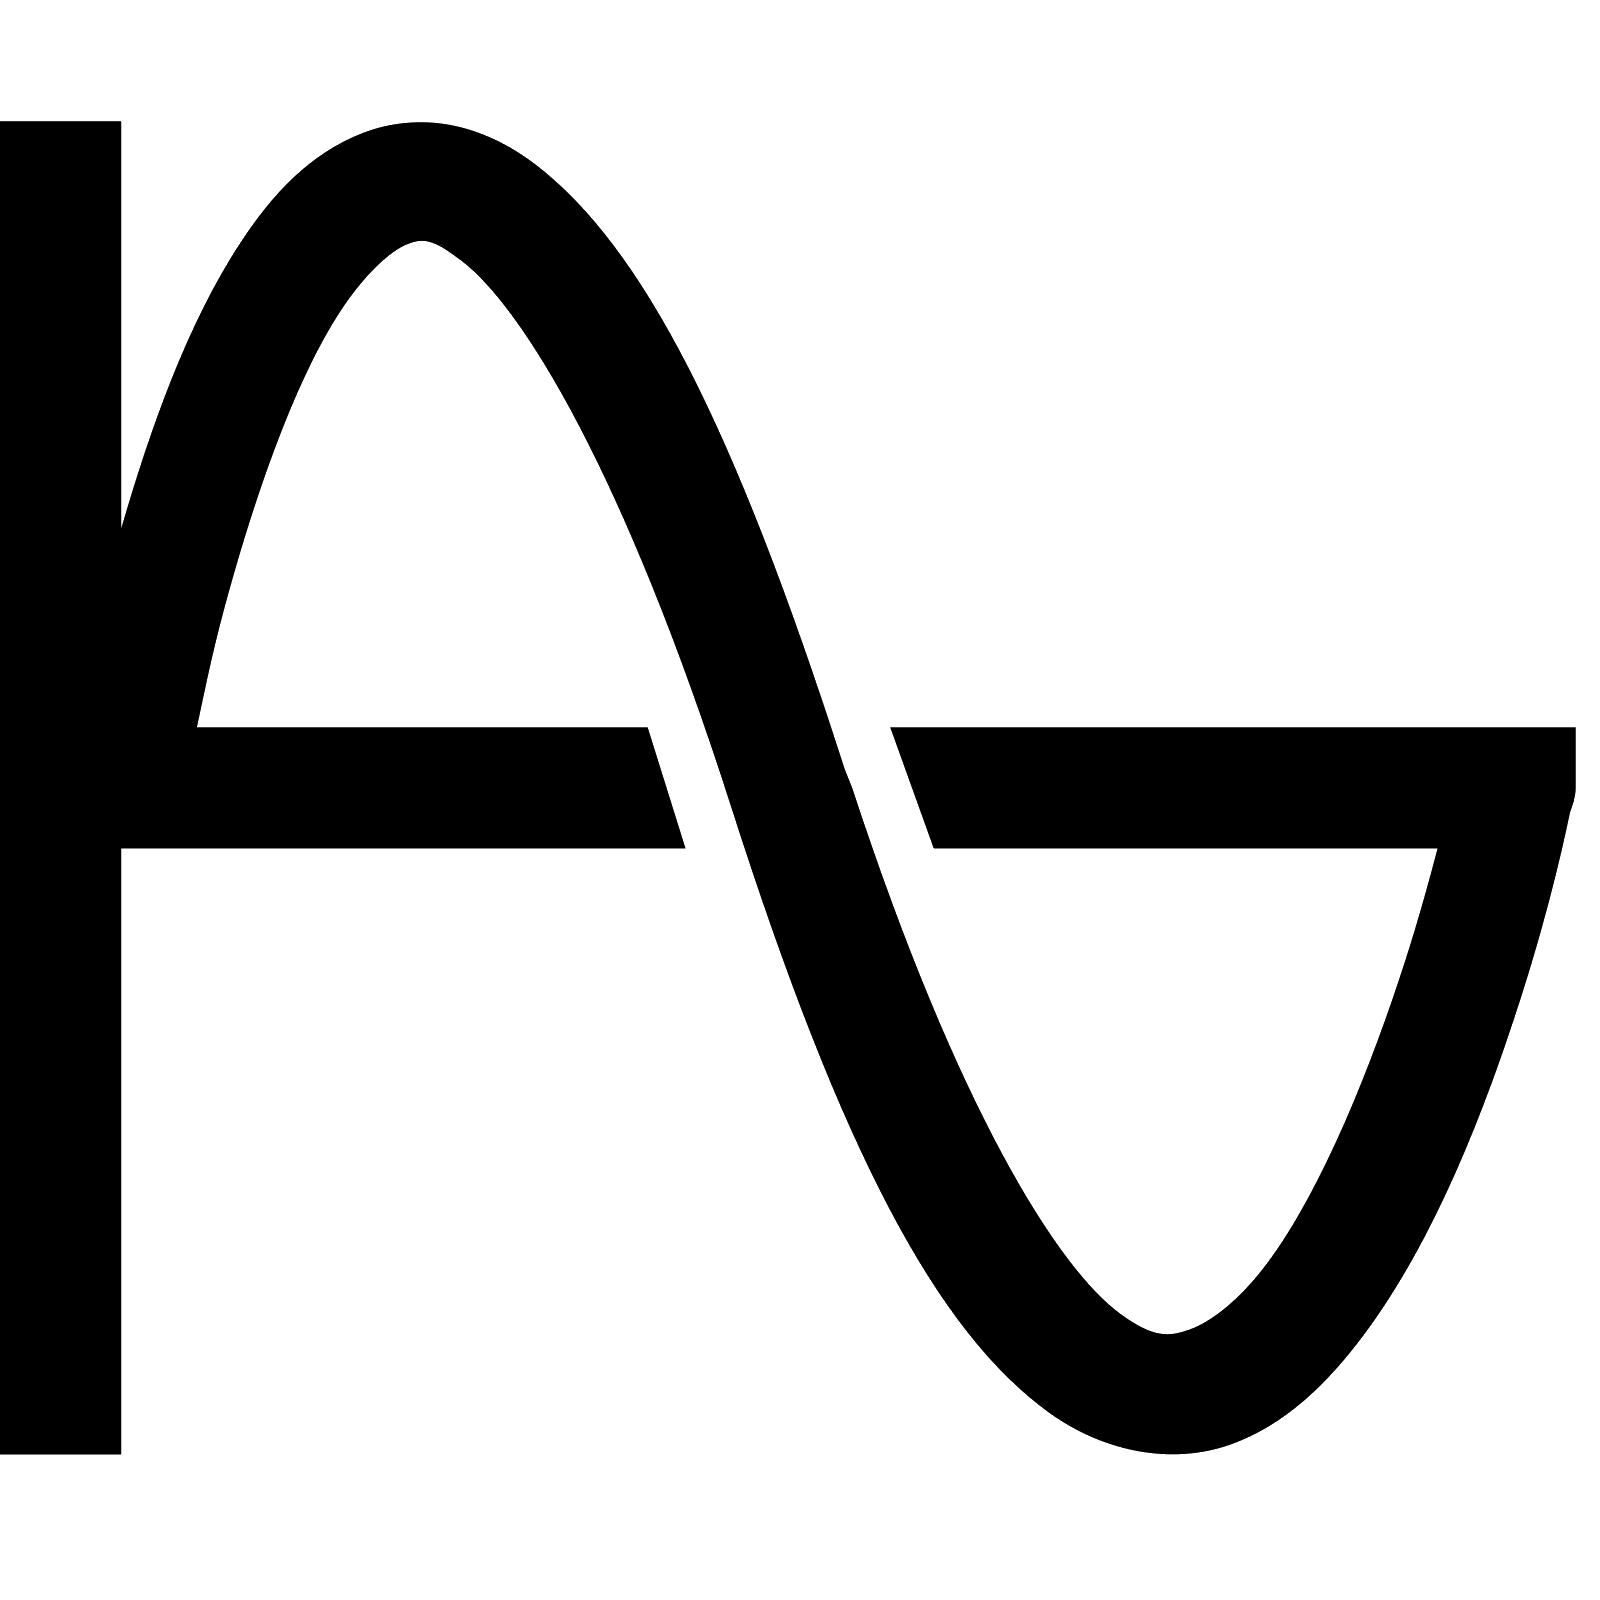 Geometry clipart trigonometric function. Sine icon free download